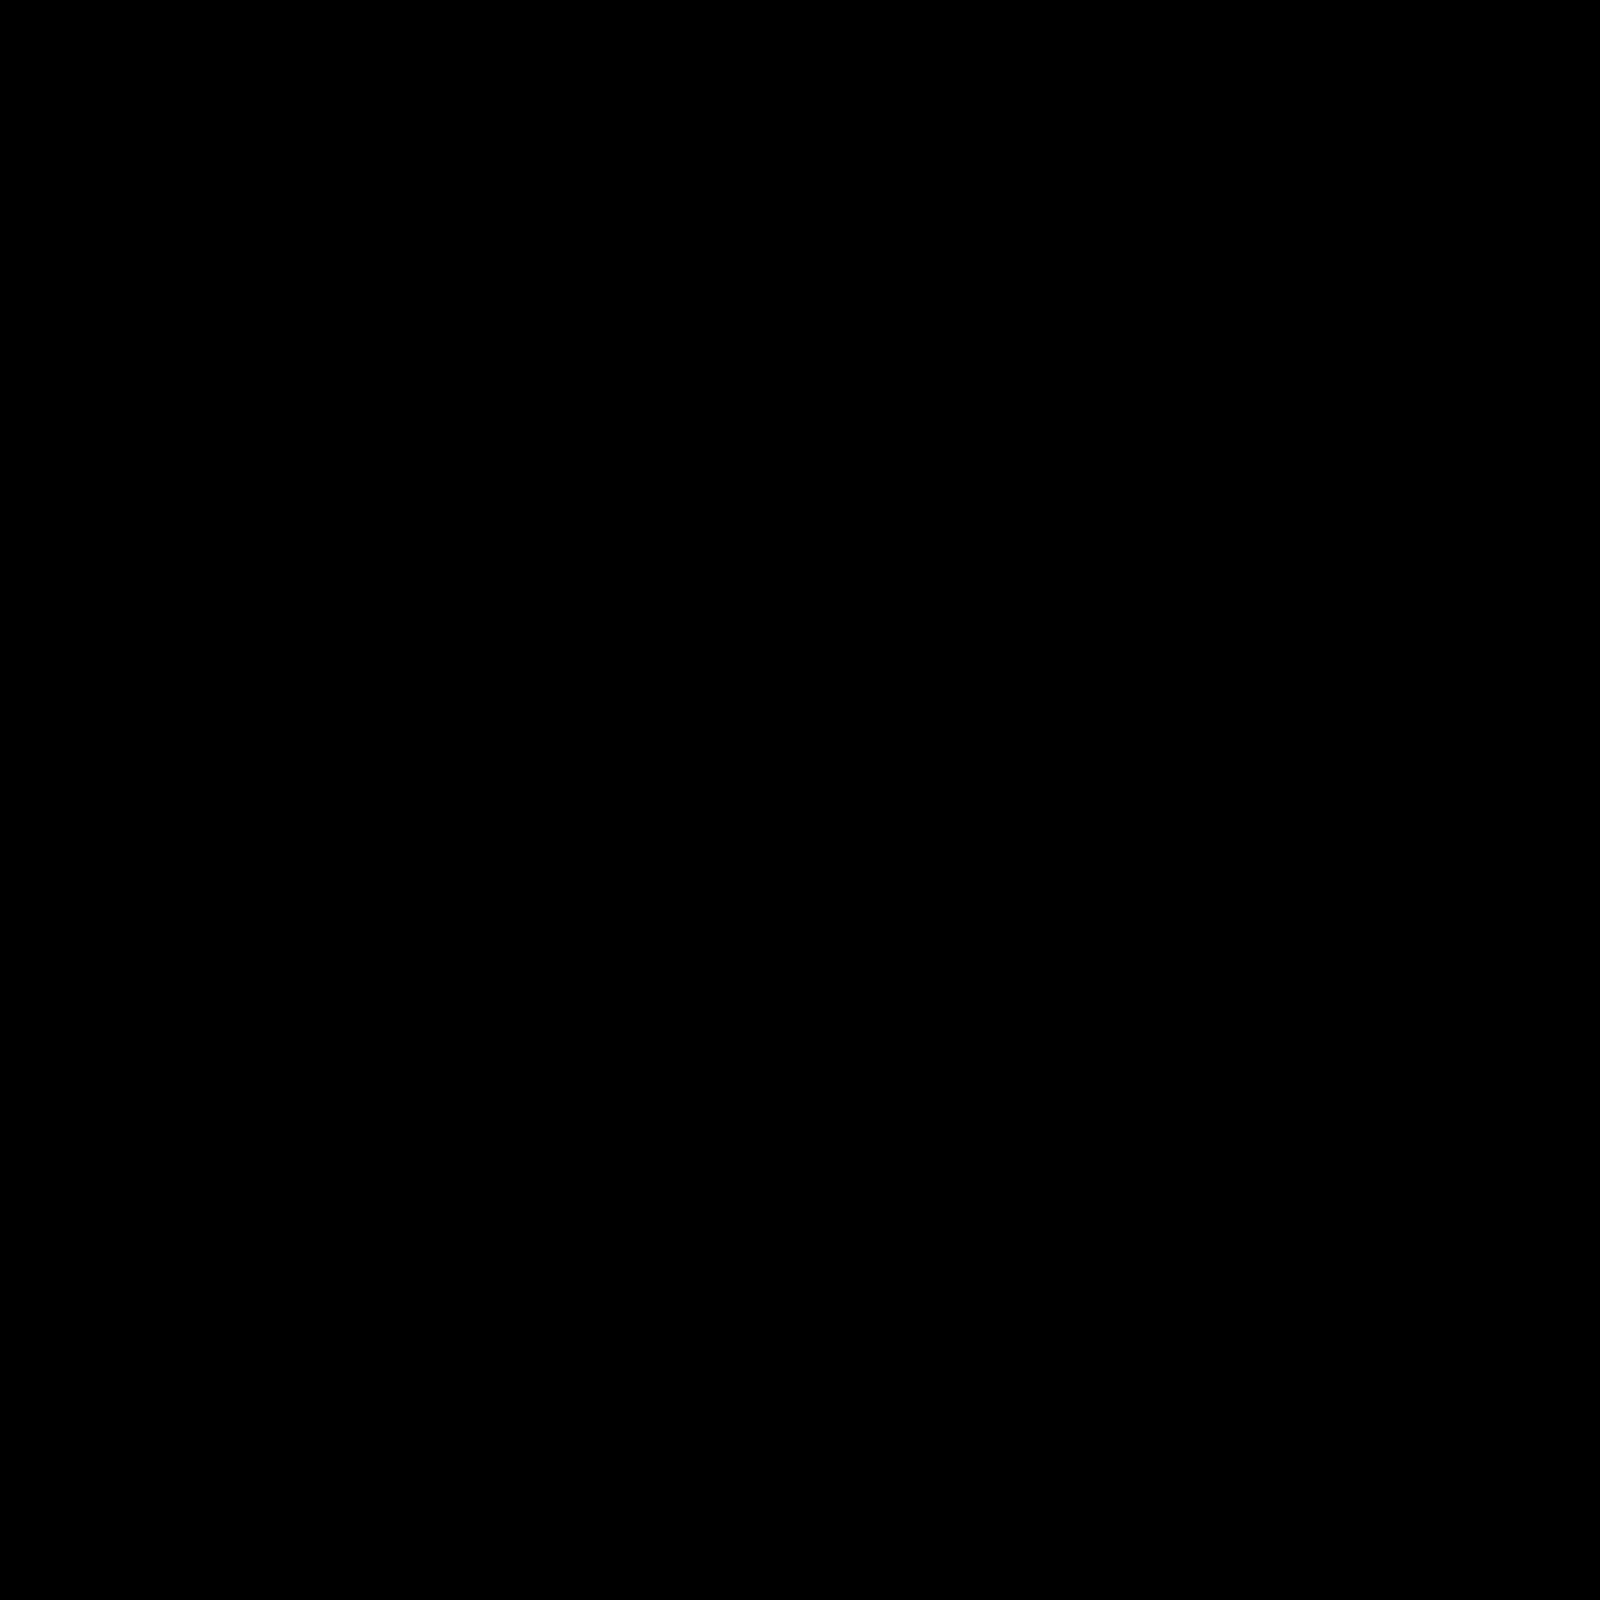 Frisbee Disk icon